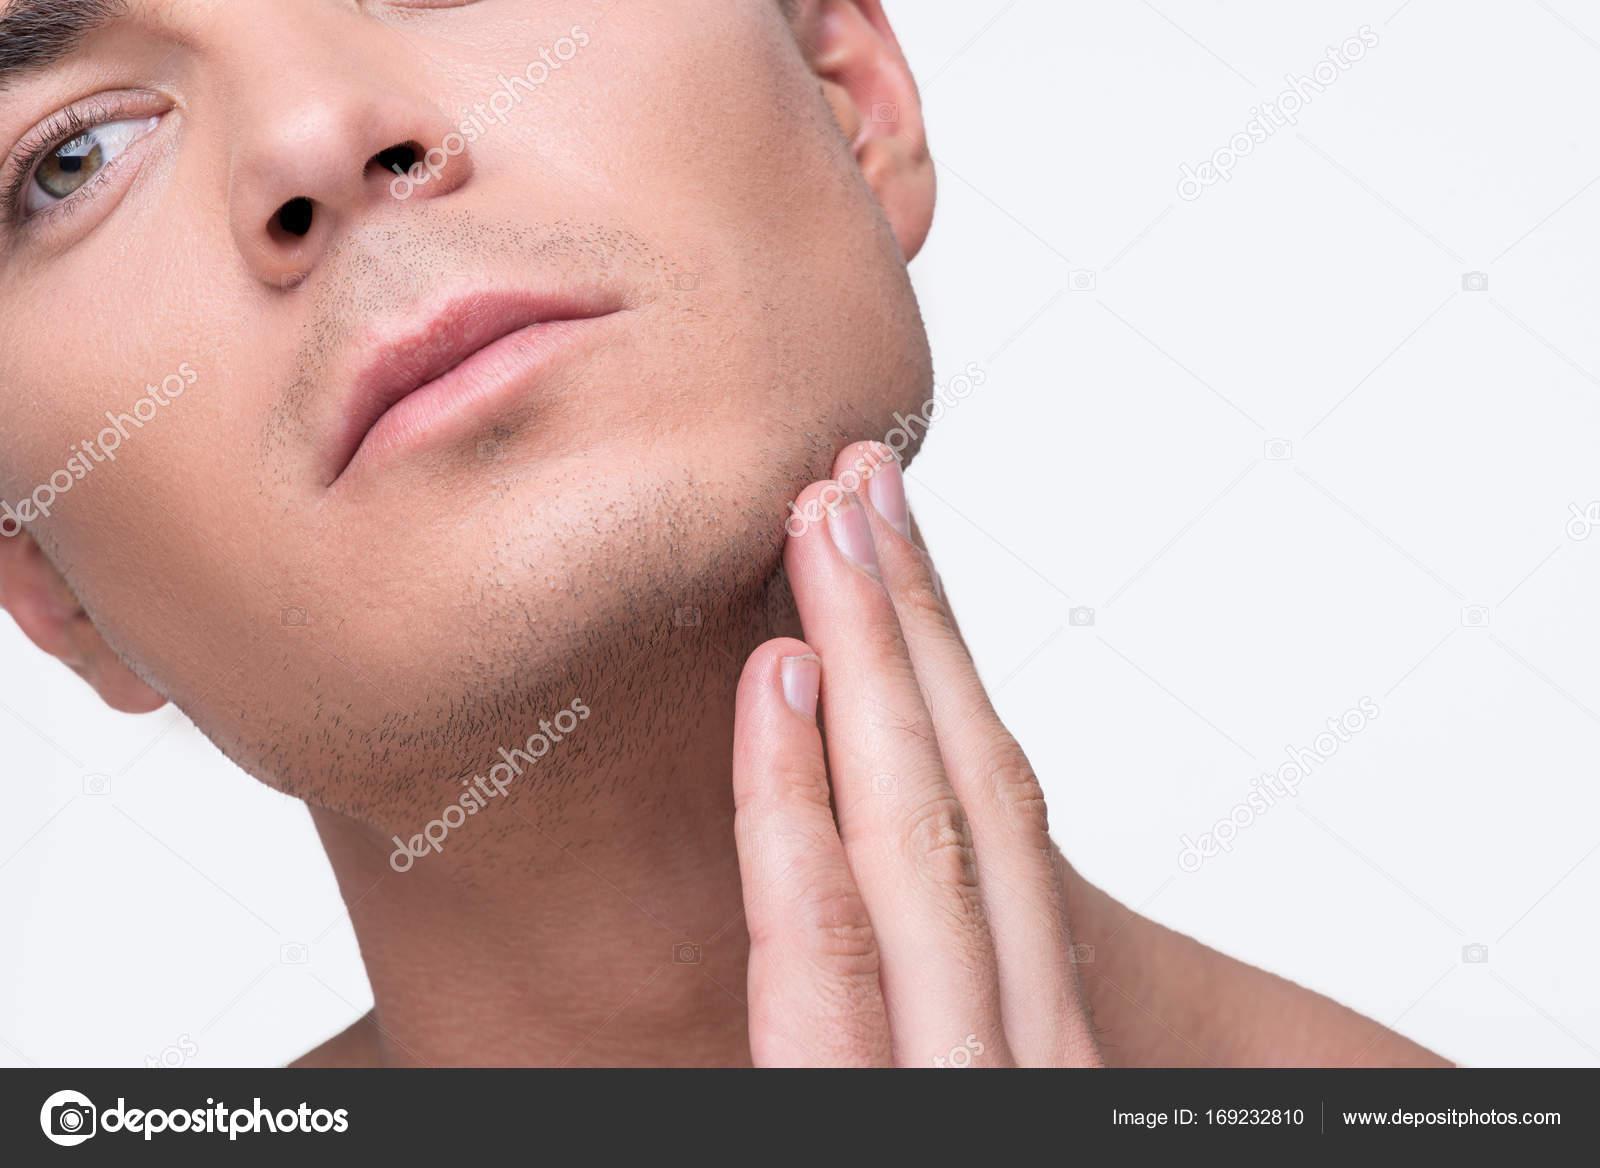 naakte pus